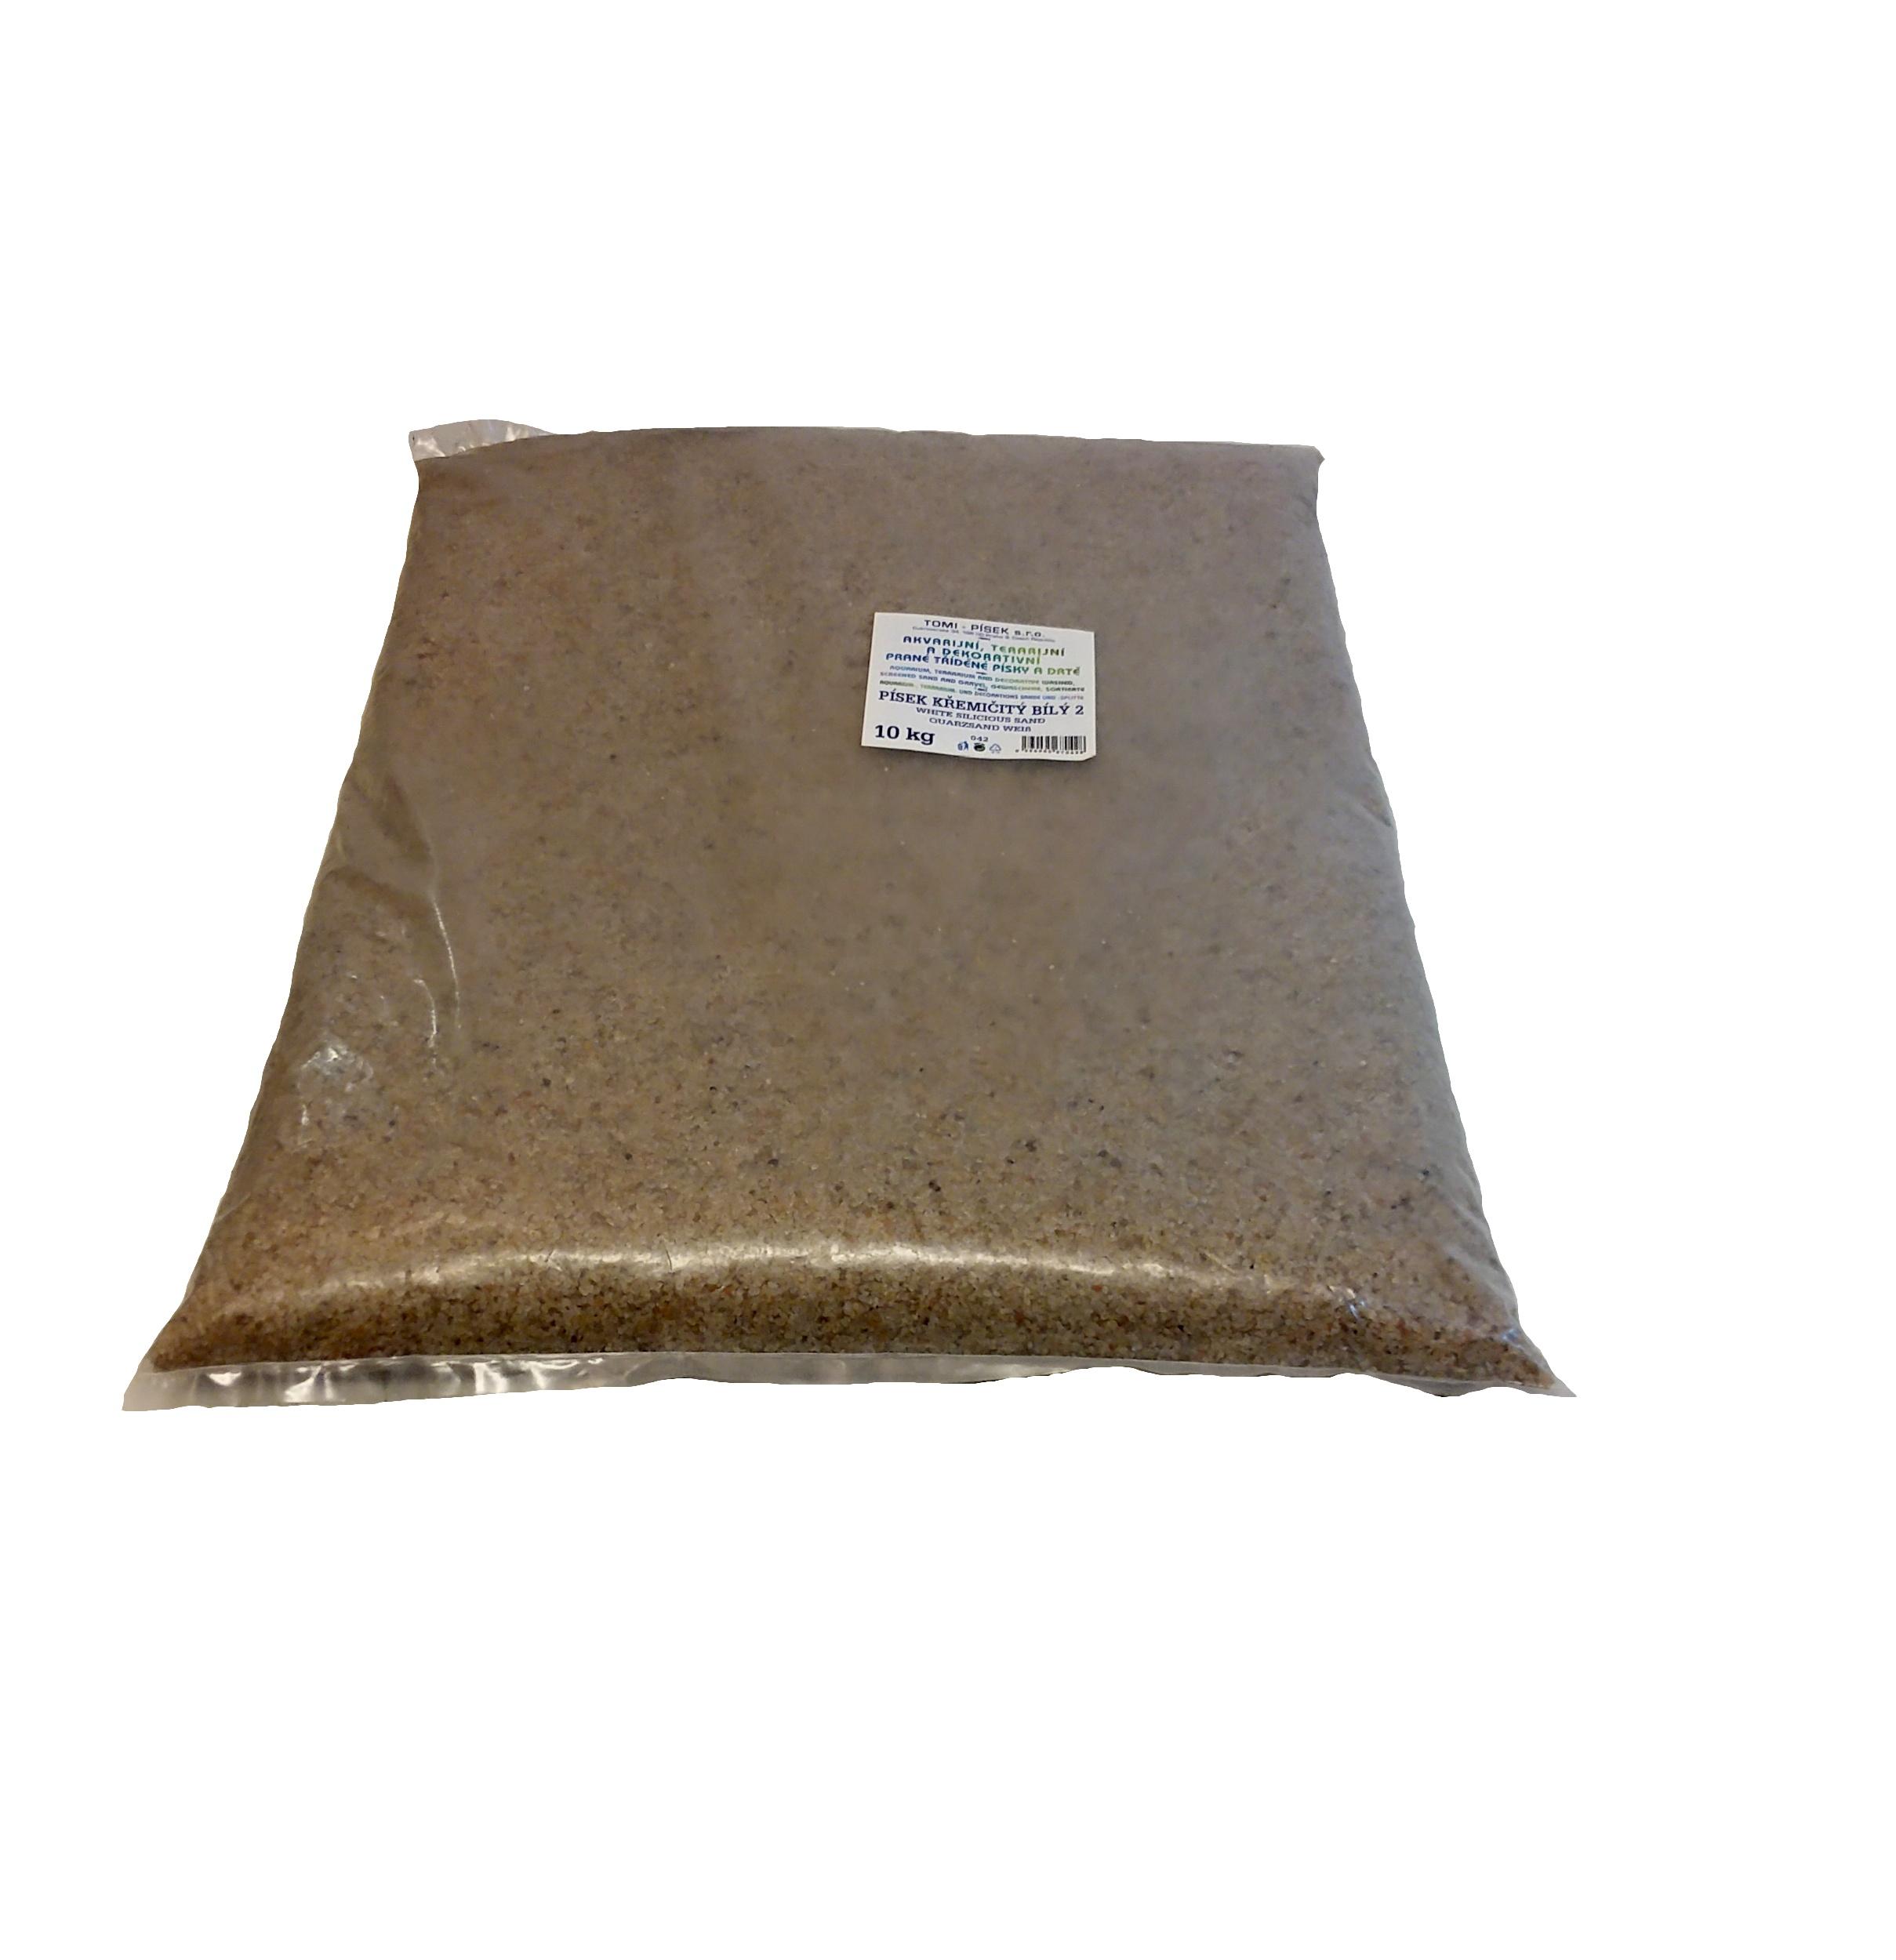 Písek křemičitý bílý To-pi č. 2 - 10 kg